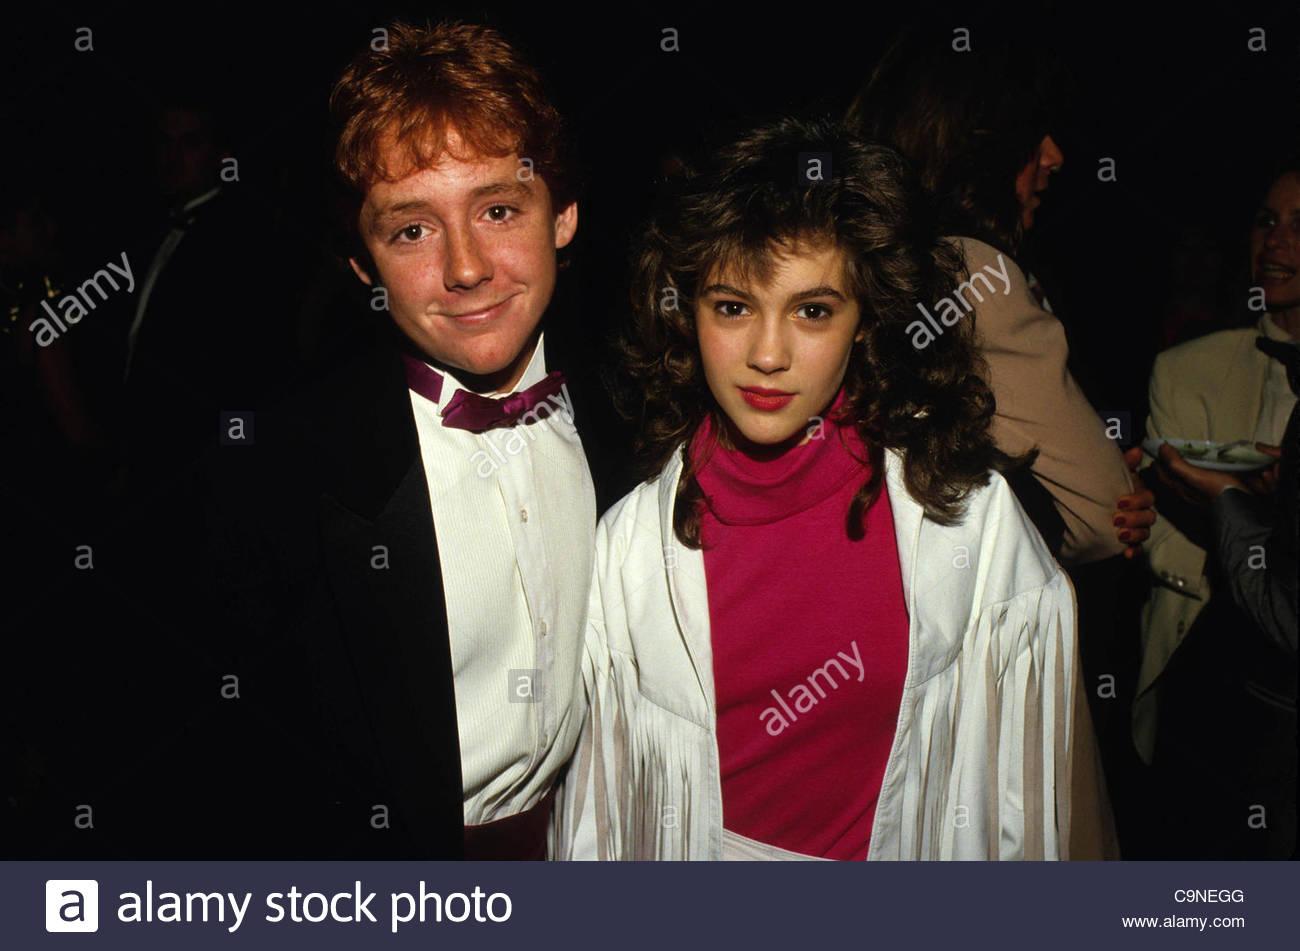 Jan. 28, 1987 - Hollywood, California, U.S. - F3745.ALYSSA ...